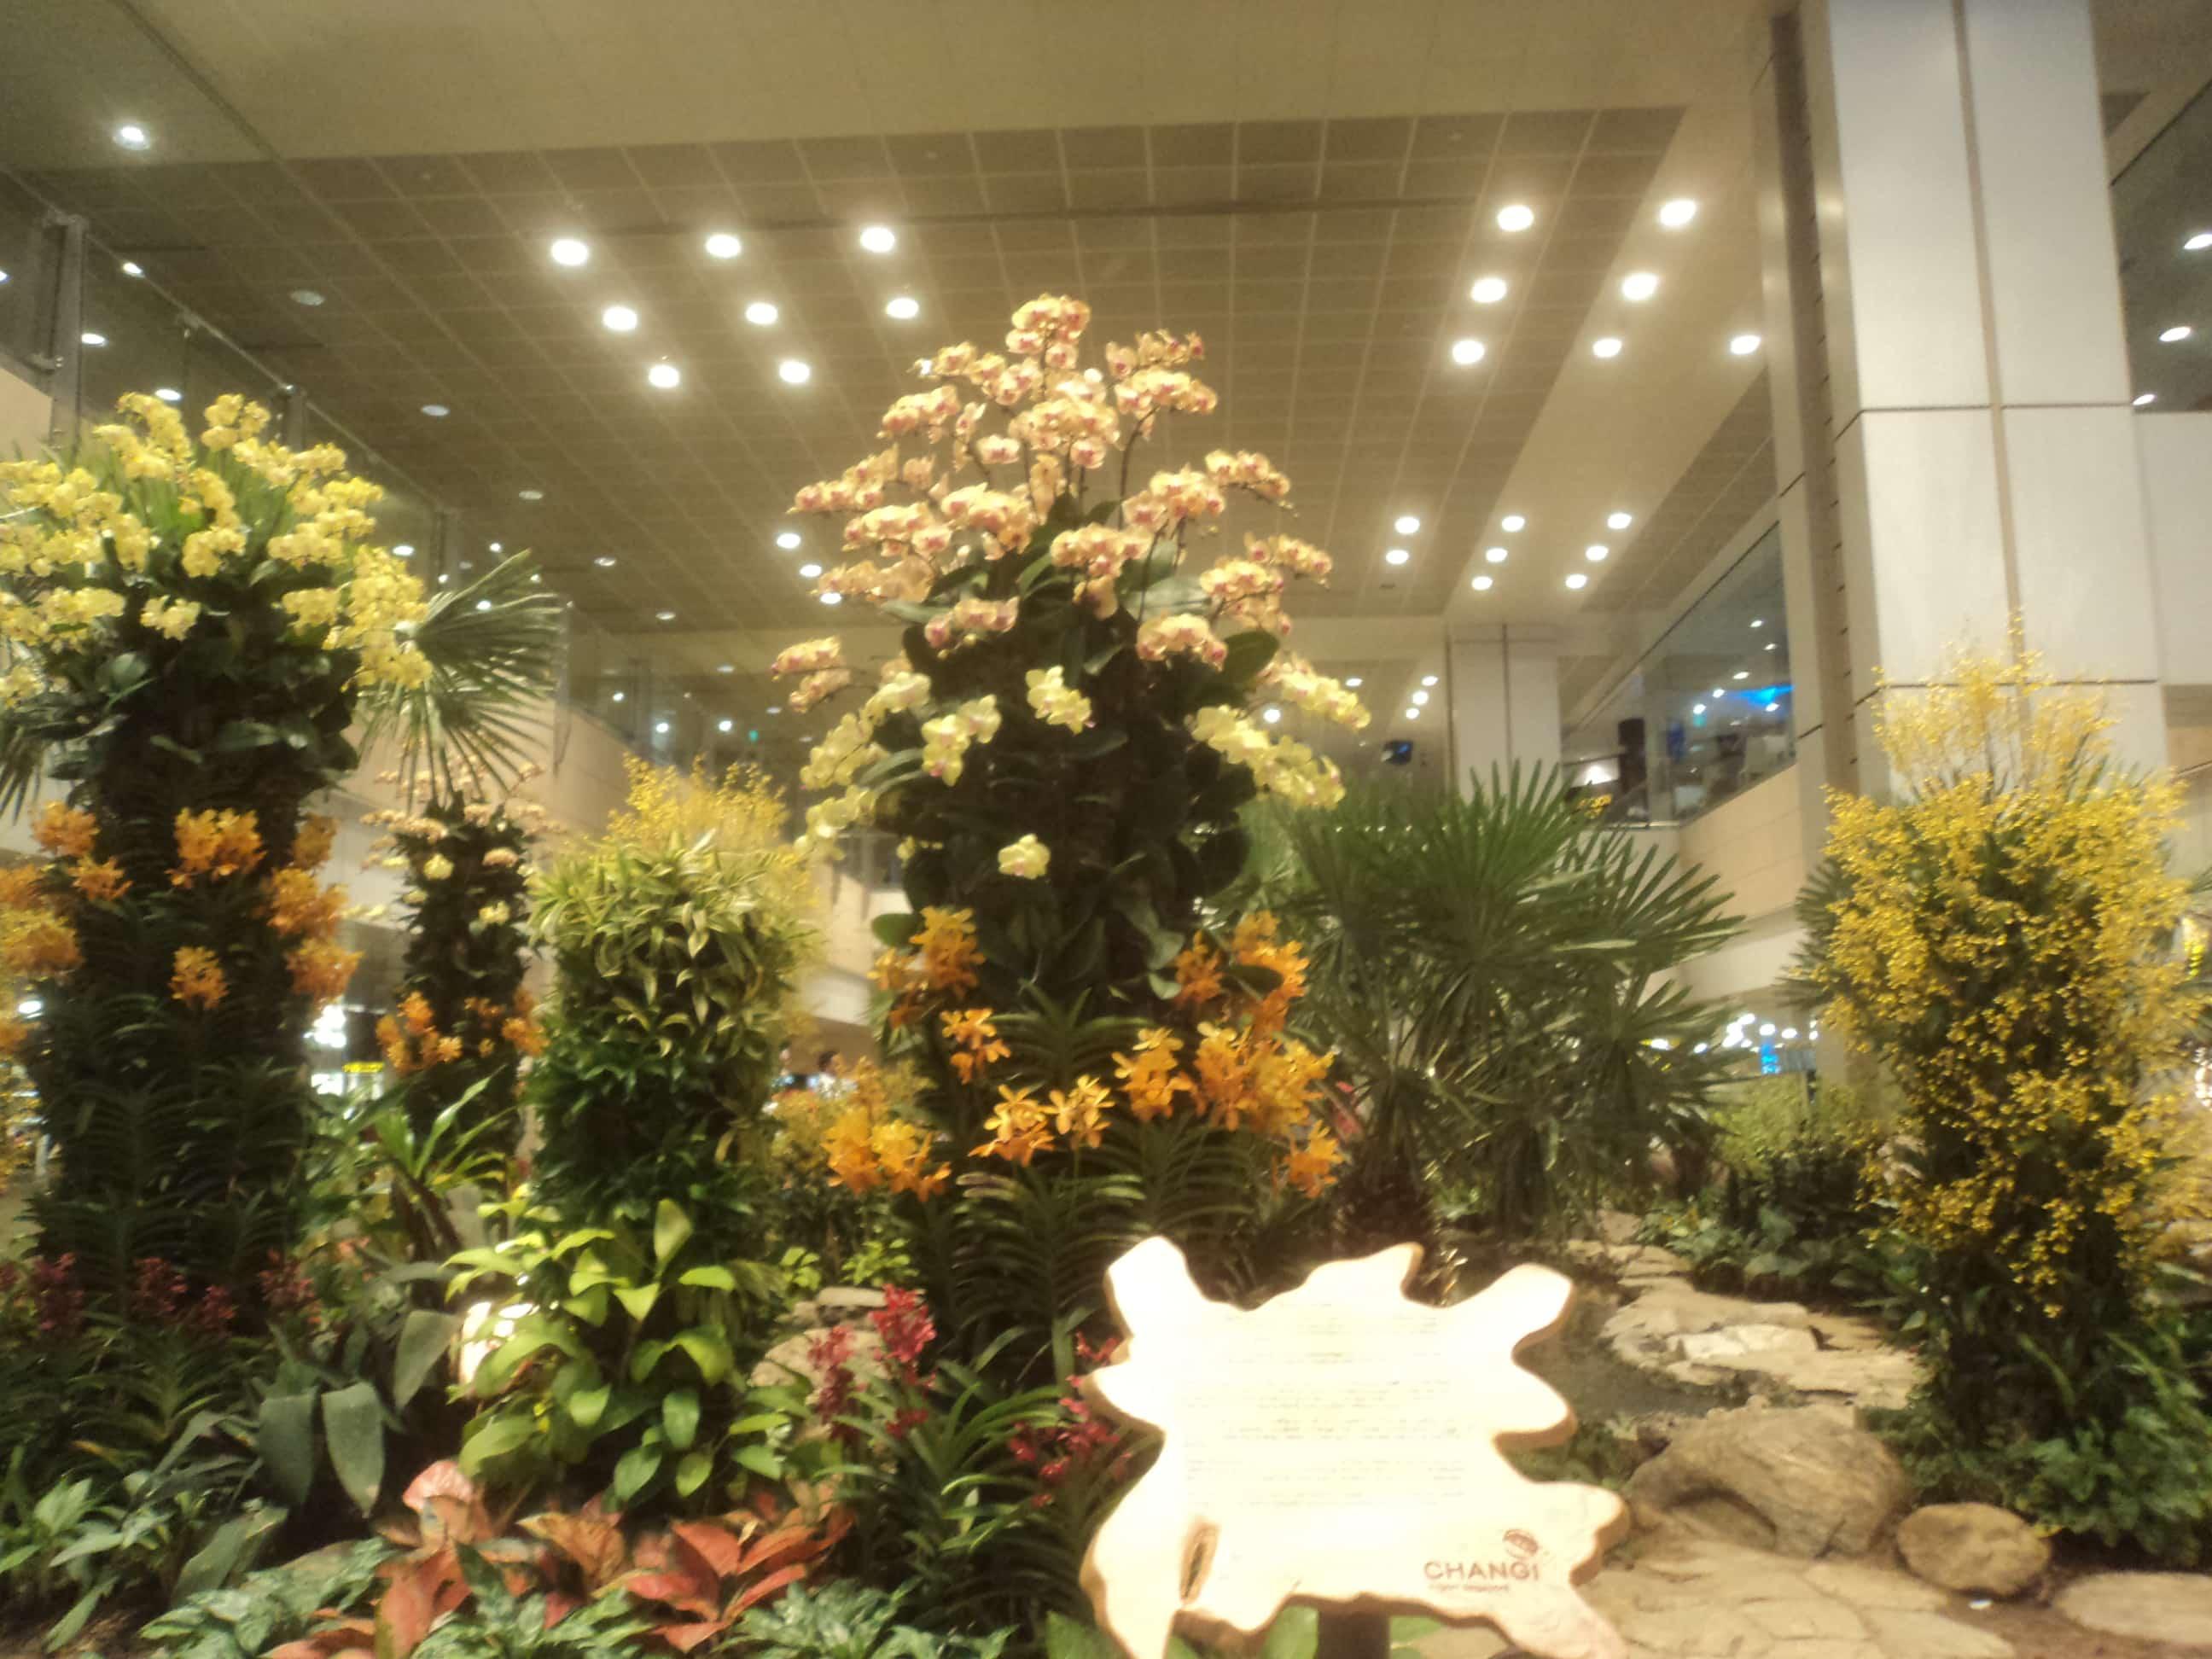 Jardin Botanico , en el aeropuerto de Singapur .